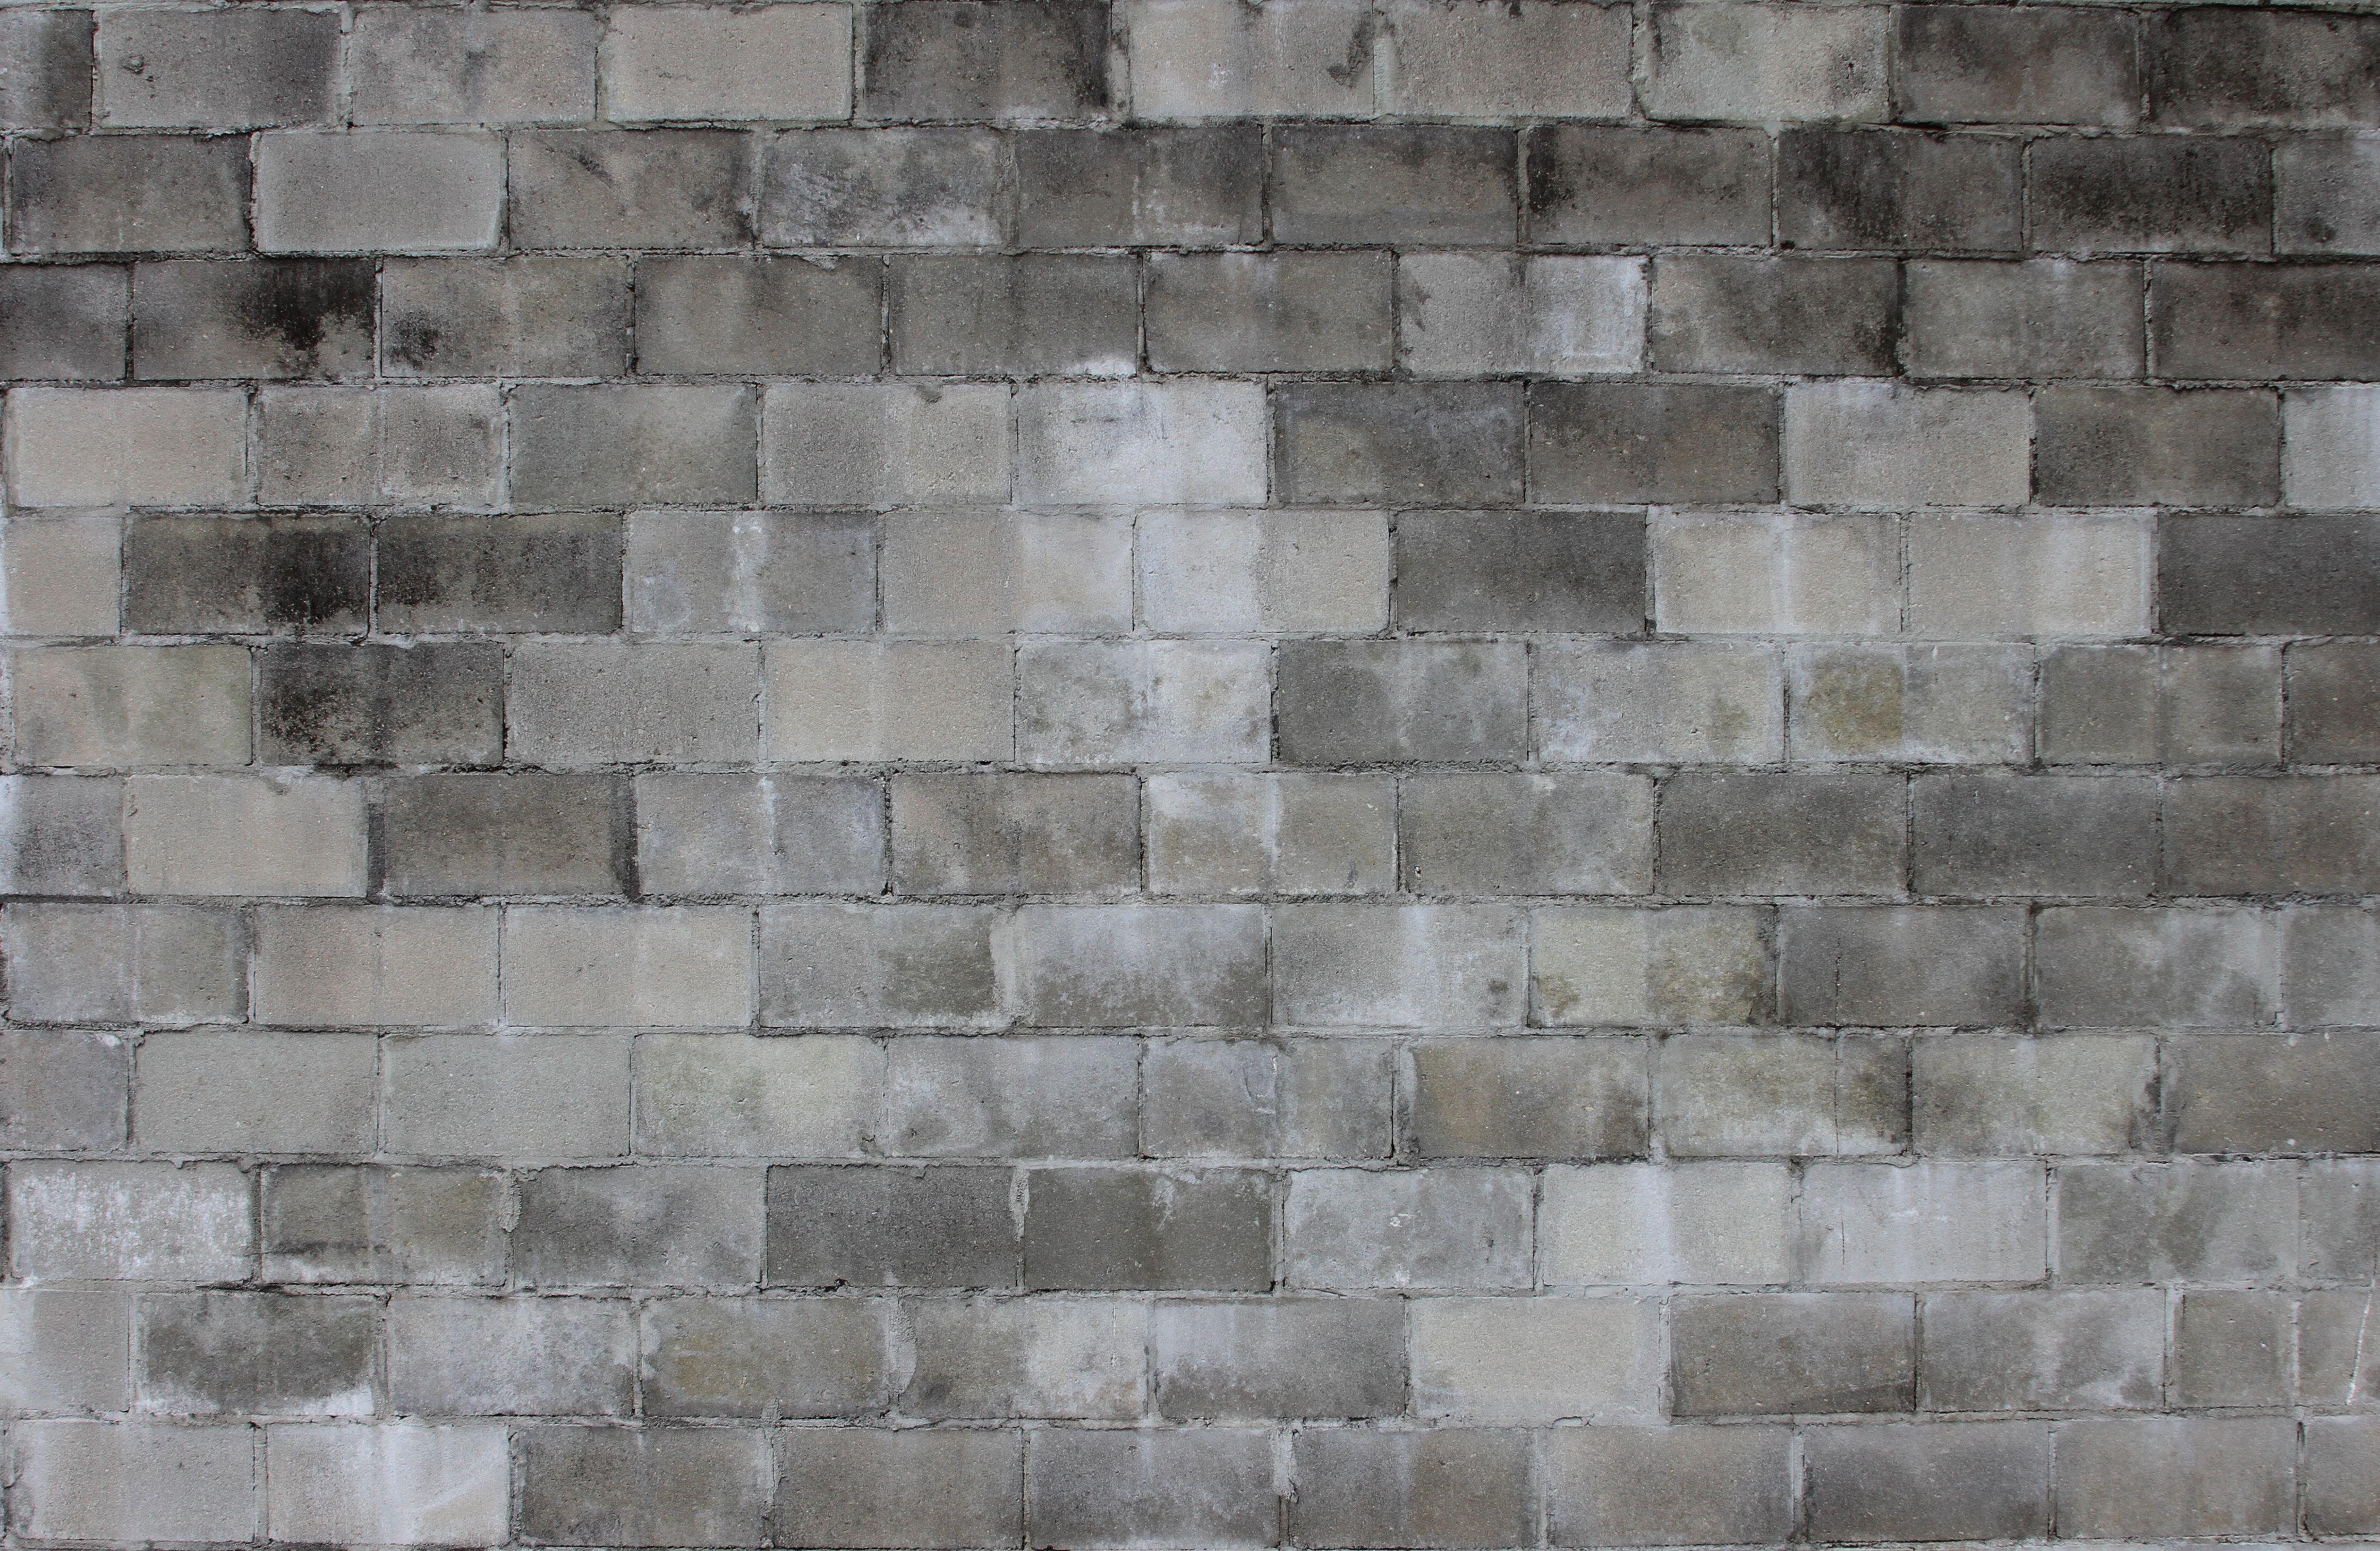 Glass Brick Texture Google Search Cinder Block Walls Block Wall Brick Texture